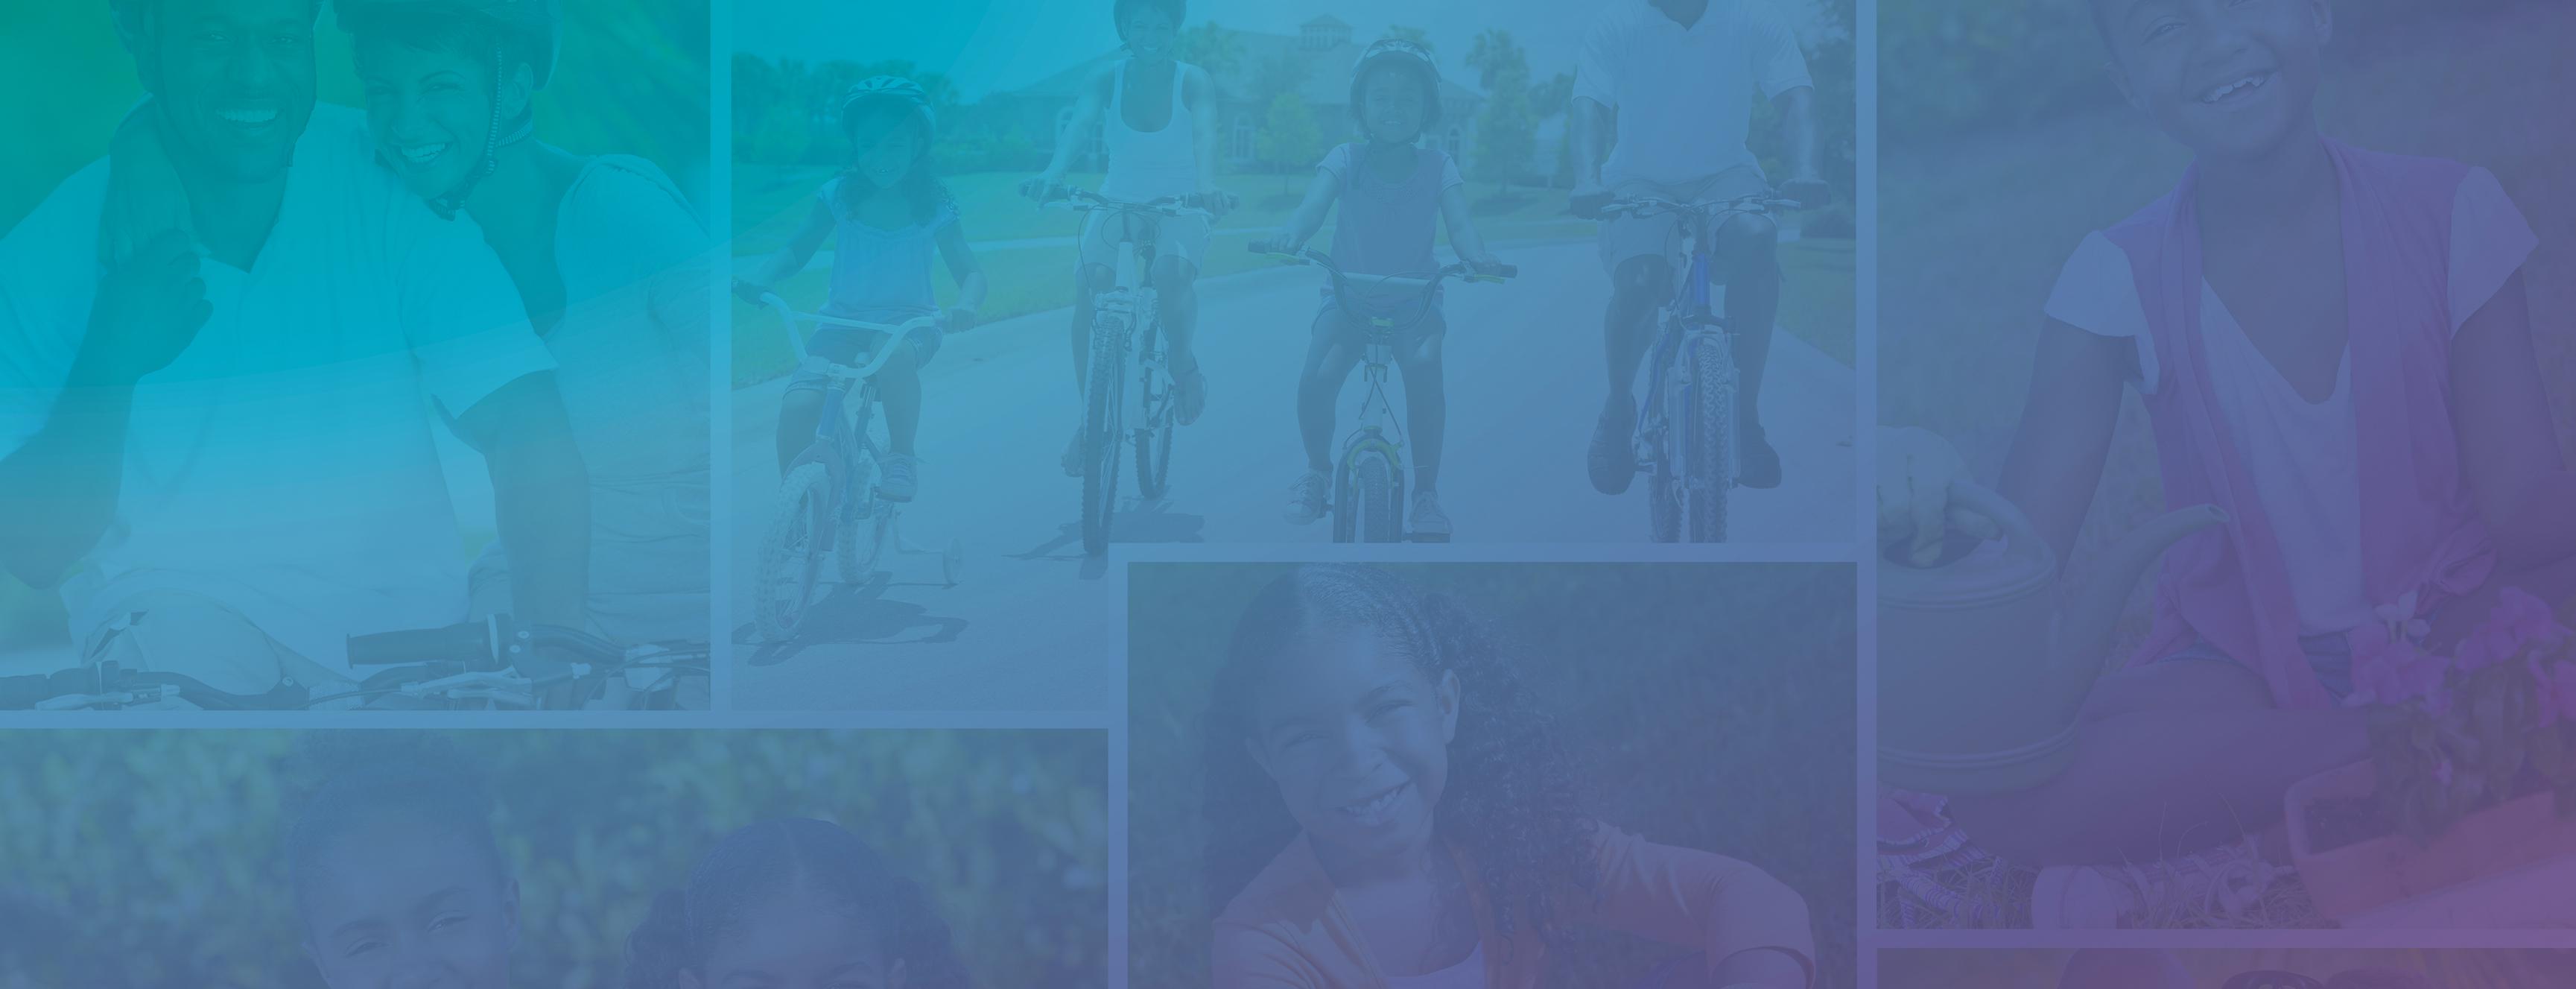 2018 F.I.T.T Health & Wellness Community Expo